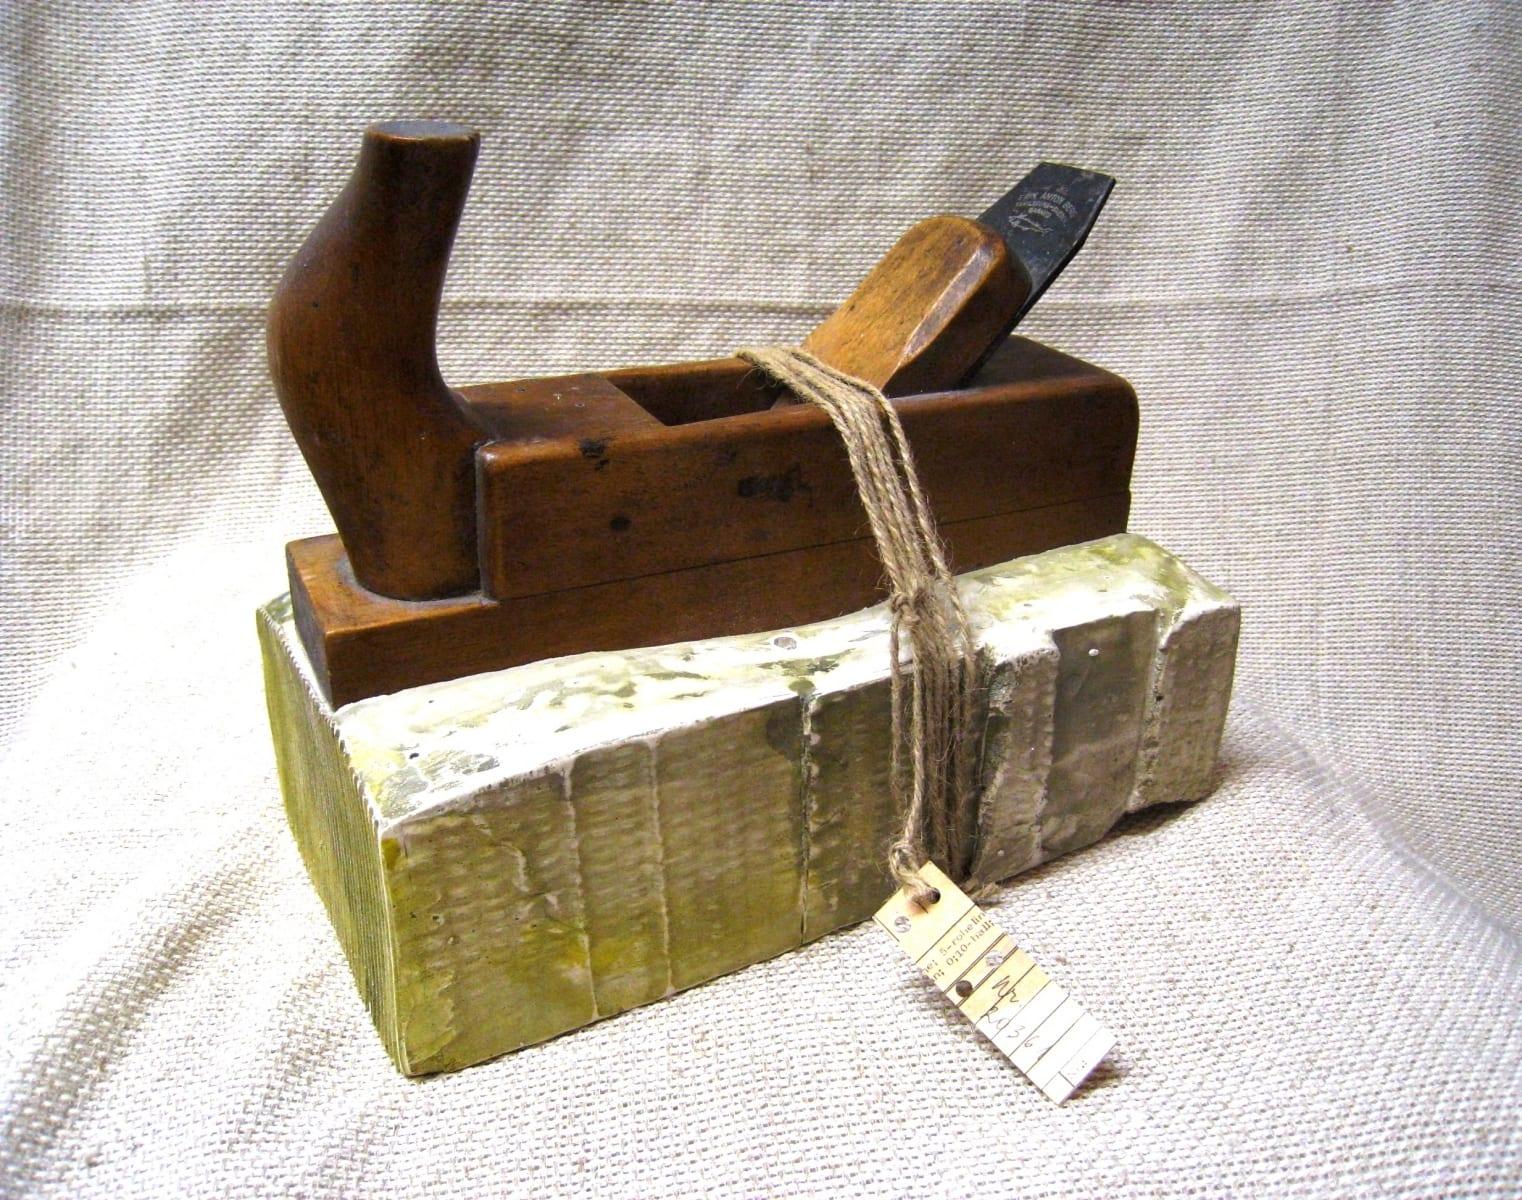 Kingitus 1  2008 kips,puit,metall,nöör,paber<br/> A GIFT 1  2008 plaster,wood,string,paper